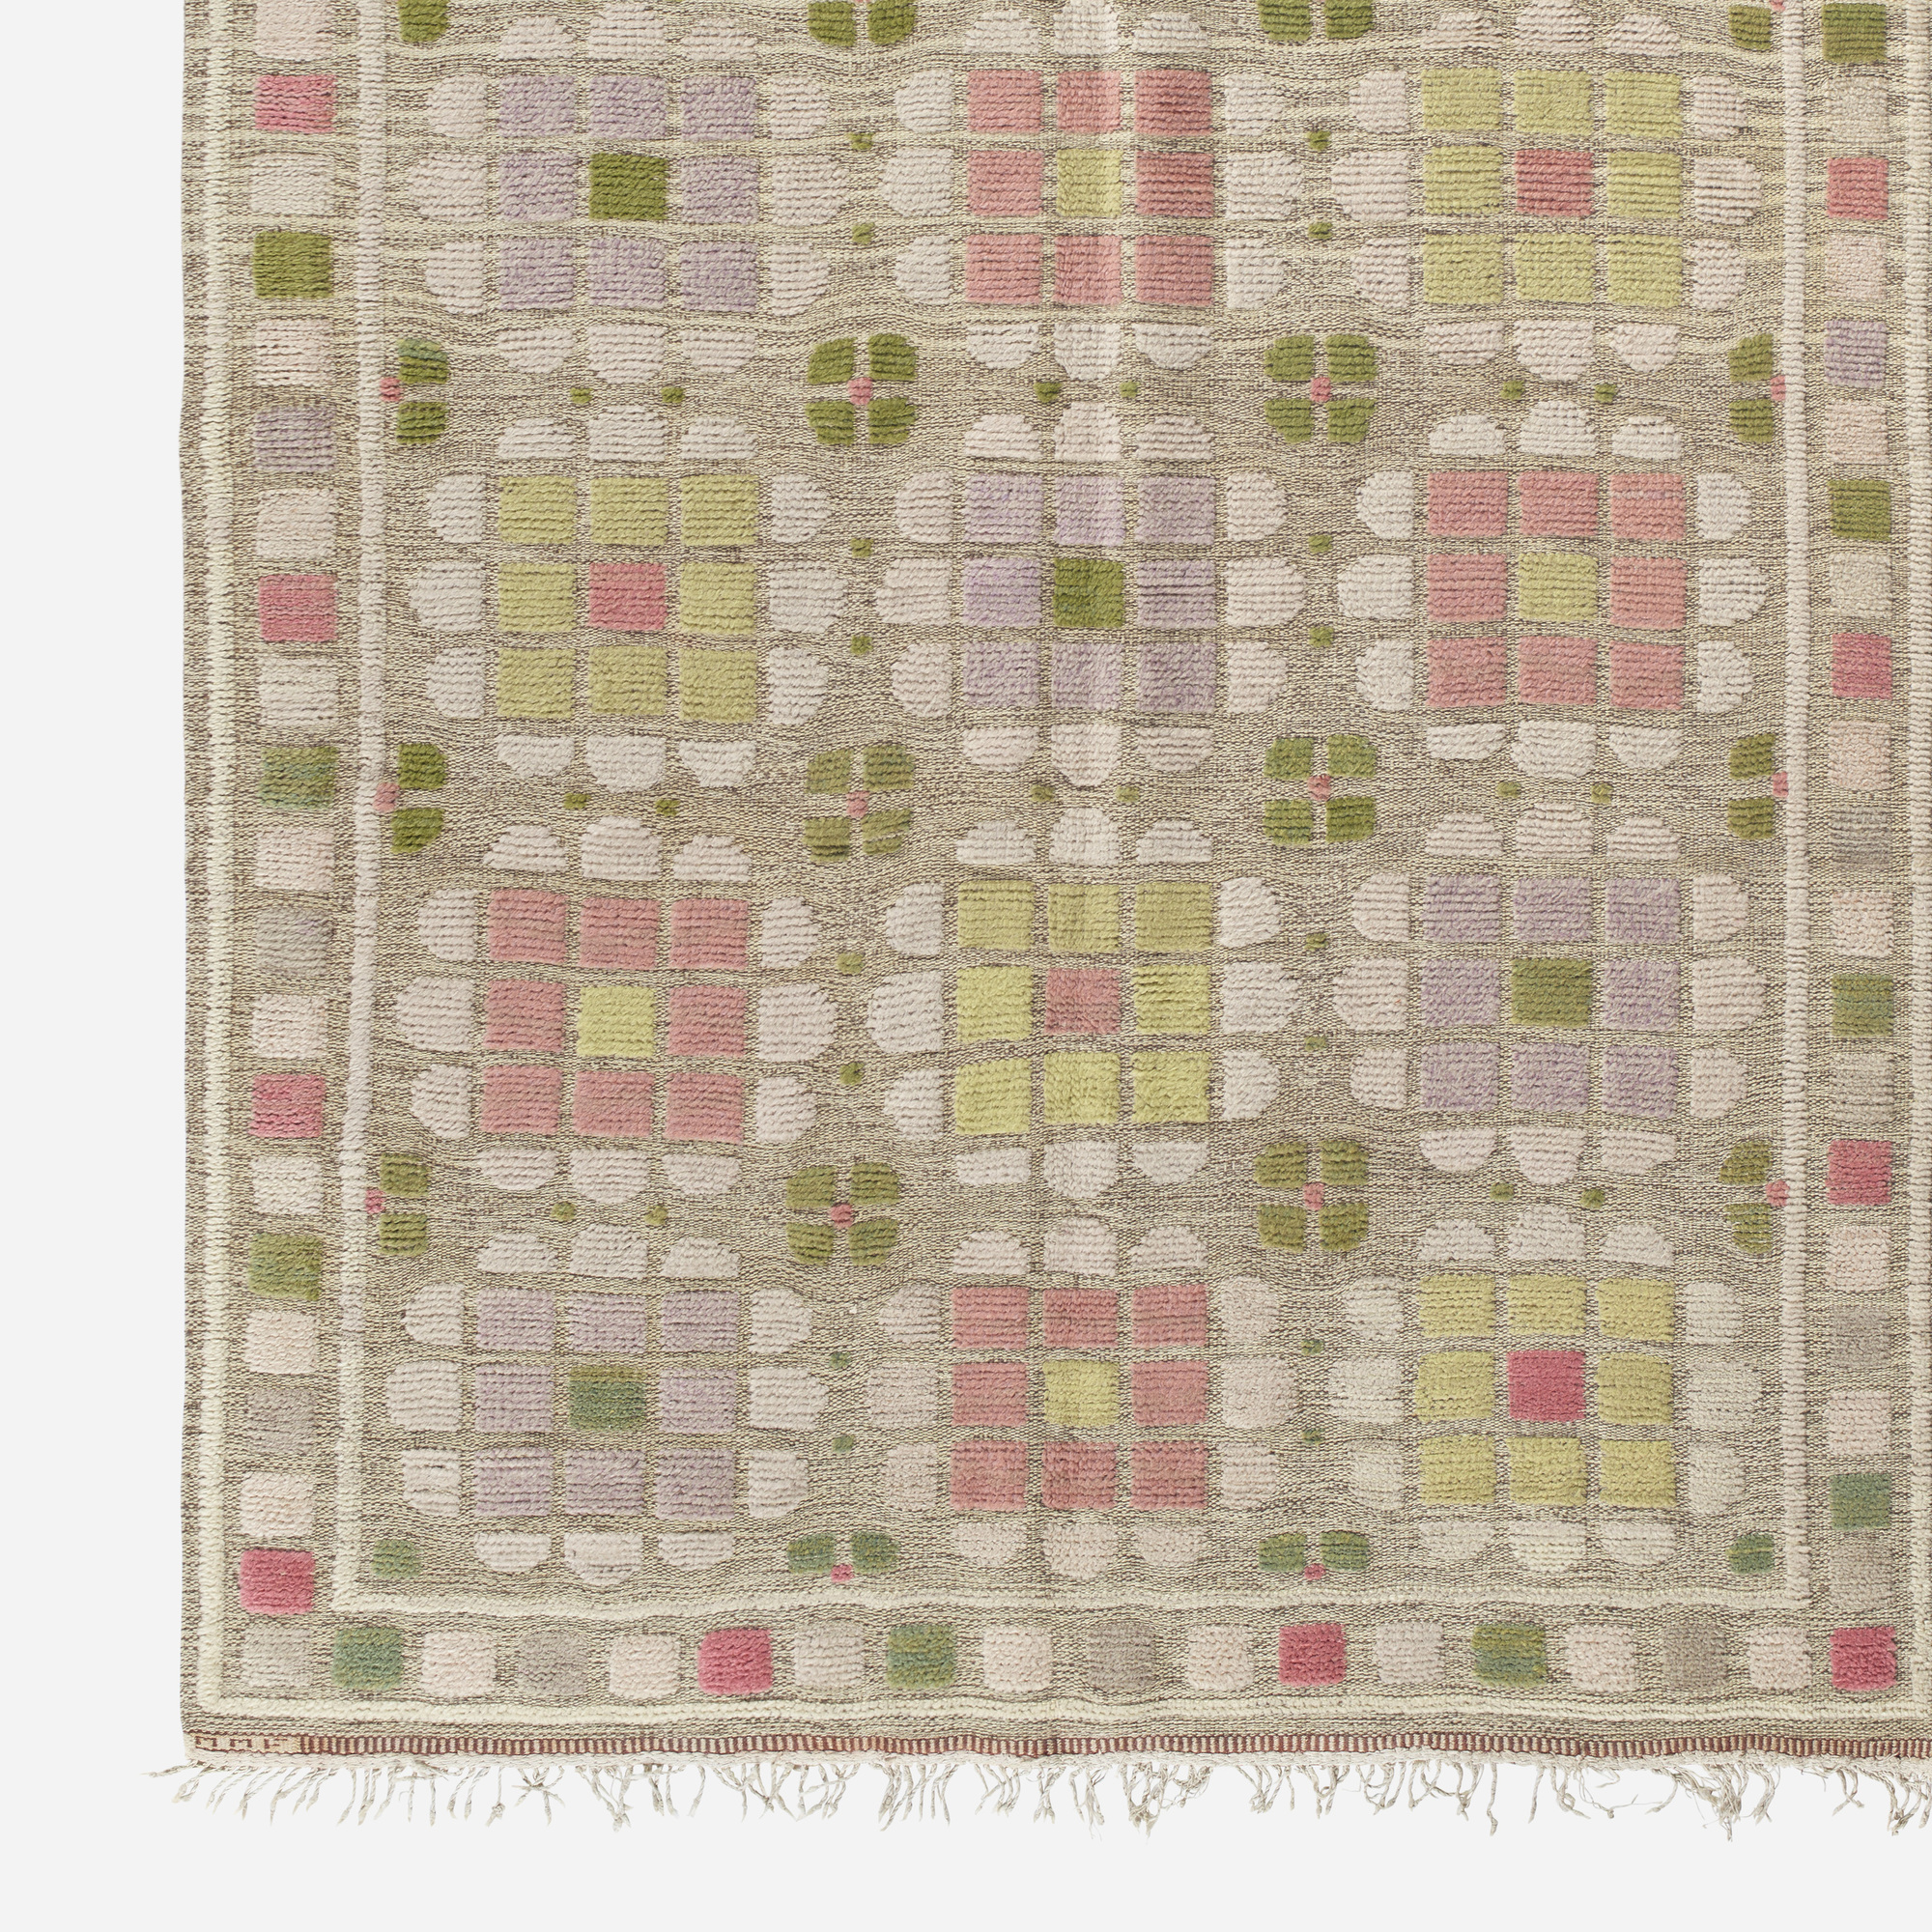 179: Märta Måås-Fjetterström / Dahlior half-pile carpet (2 of 3)